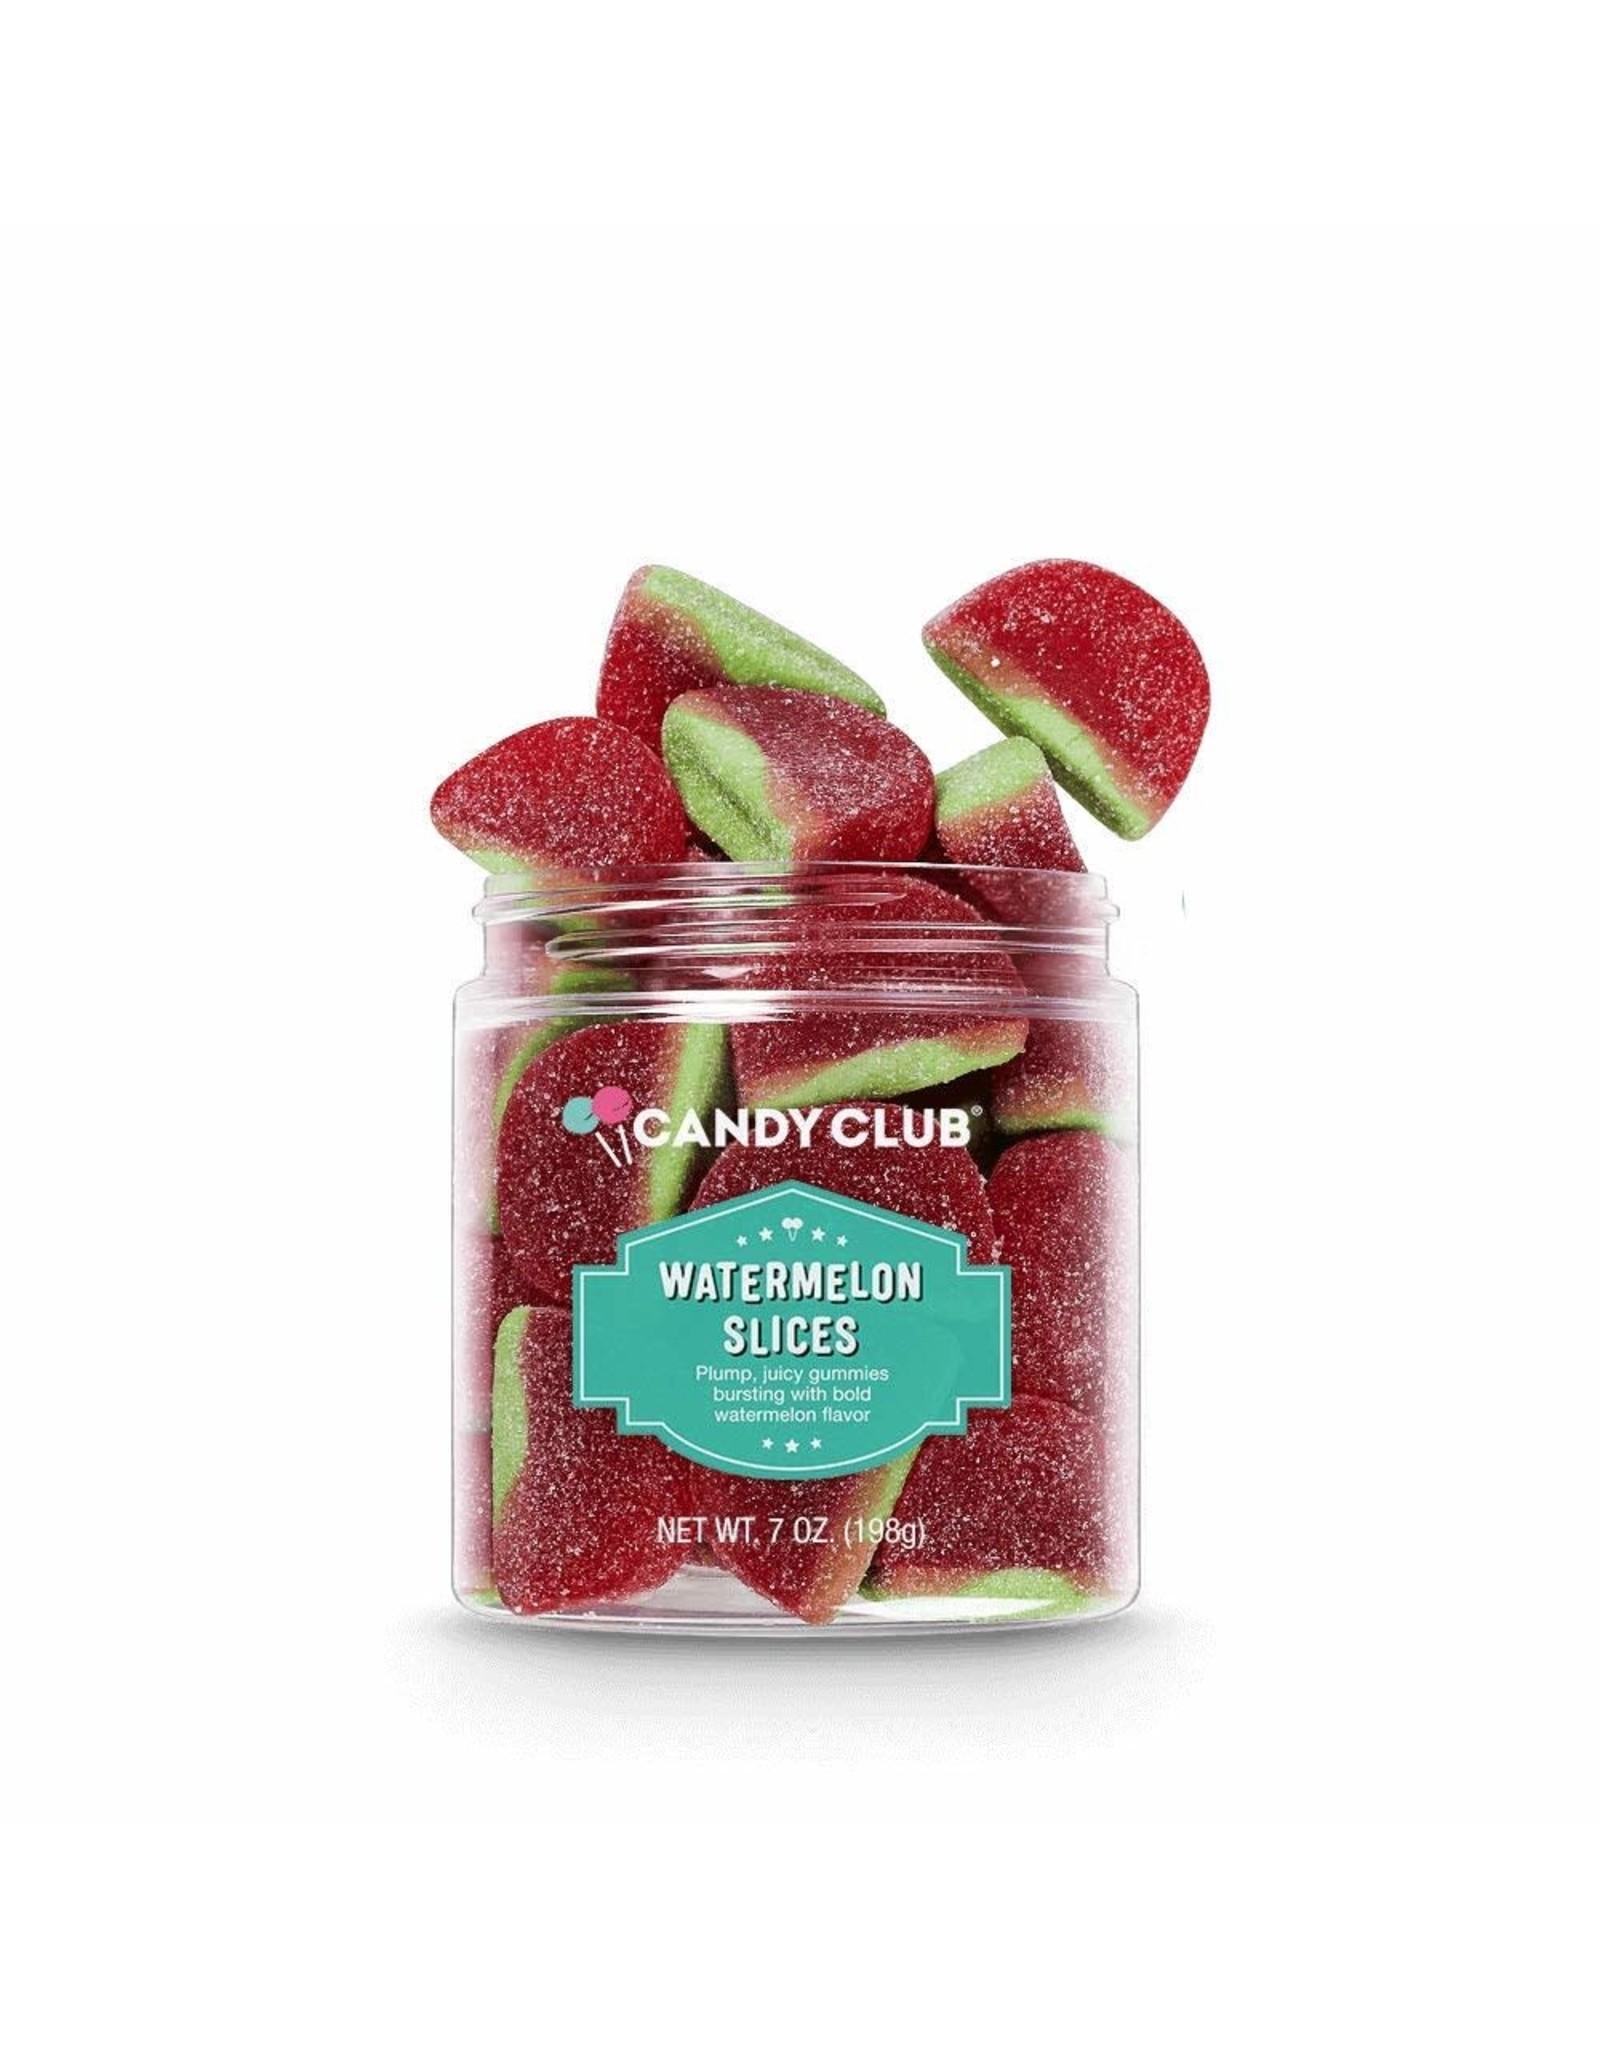 Candy Club Candy, Watermelon Slices, 7oz